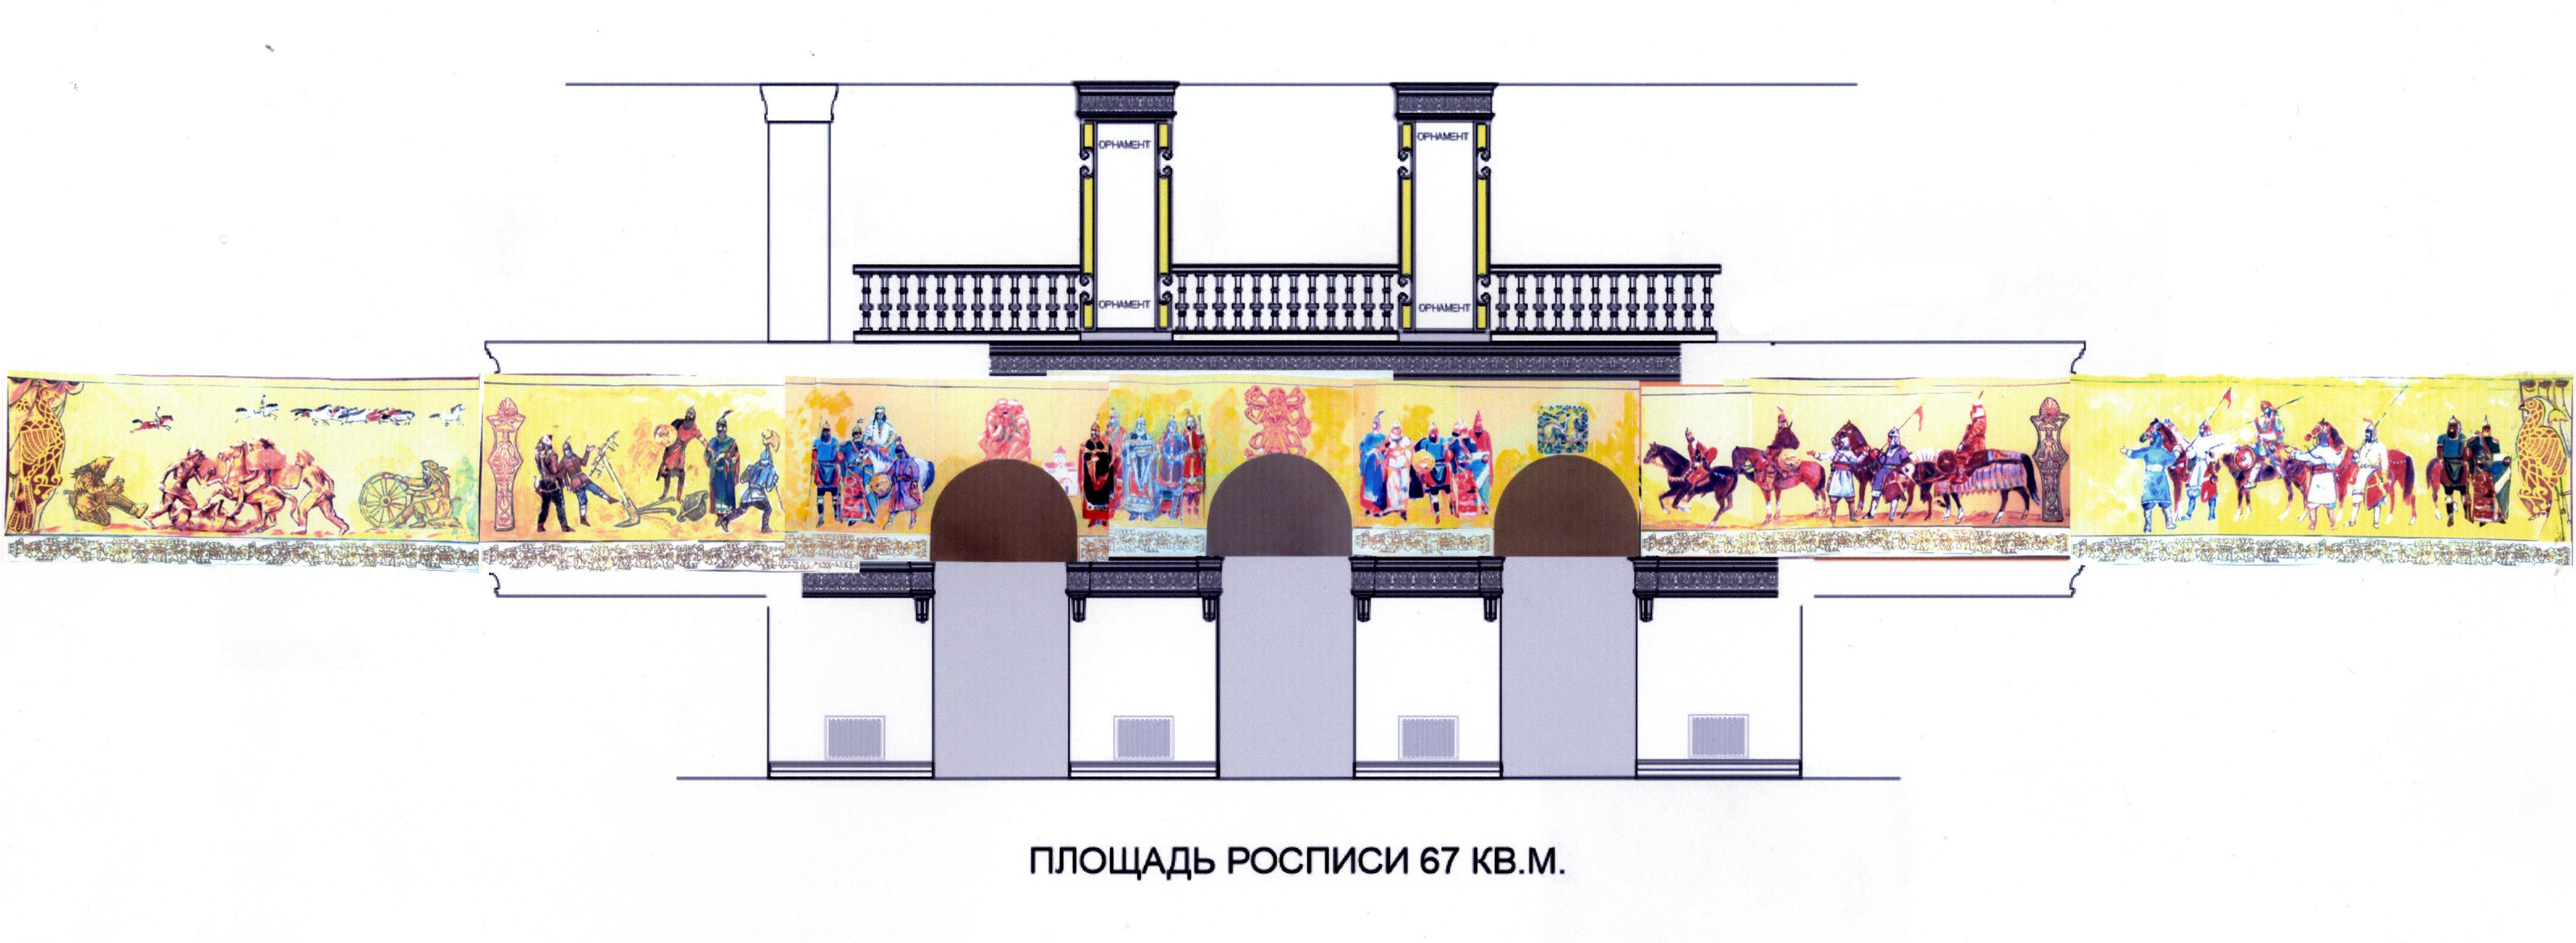 Эскиз росписи фойе Госдрамтеатра РЮО Л.Касоева